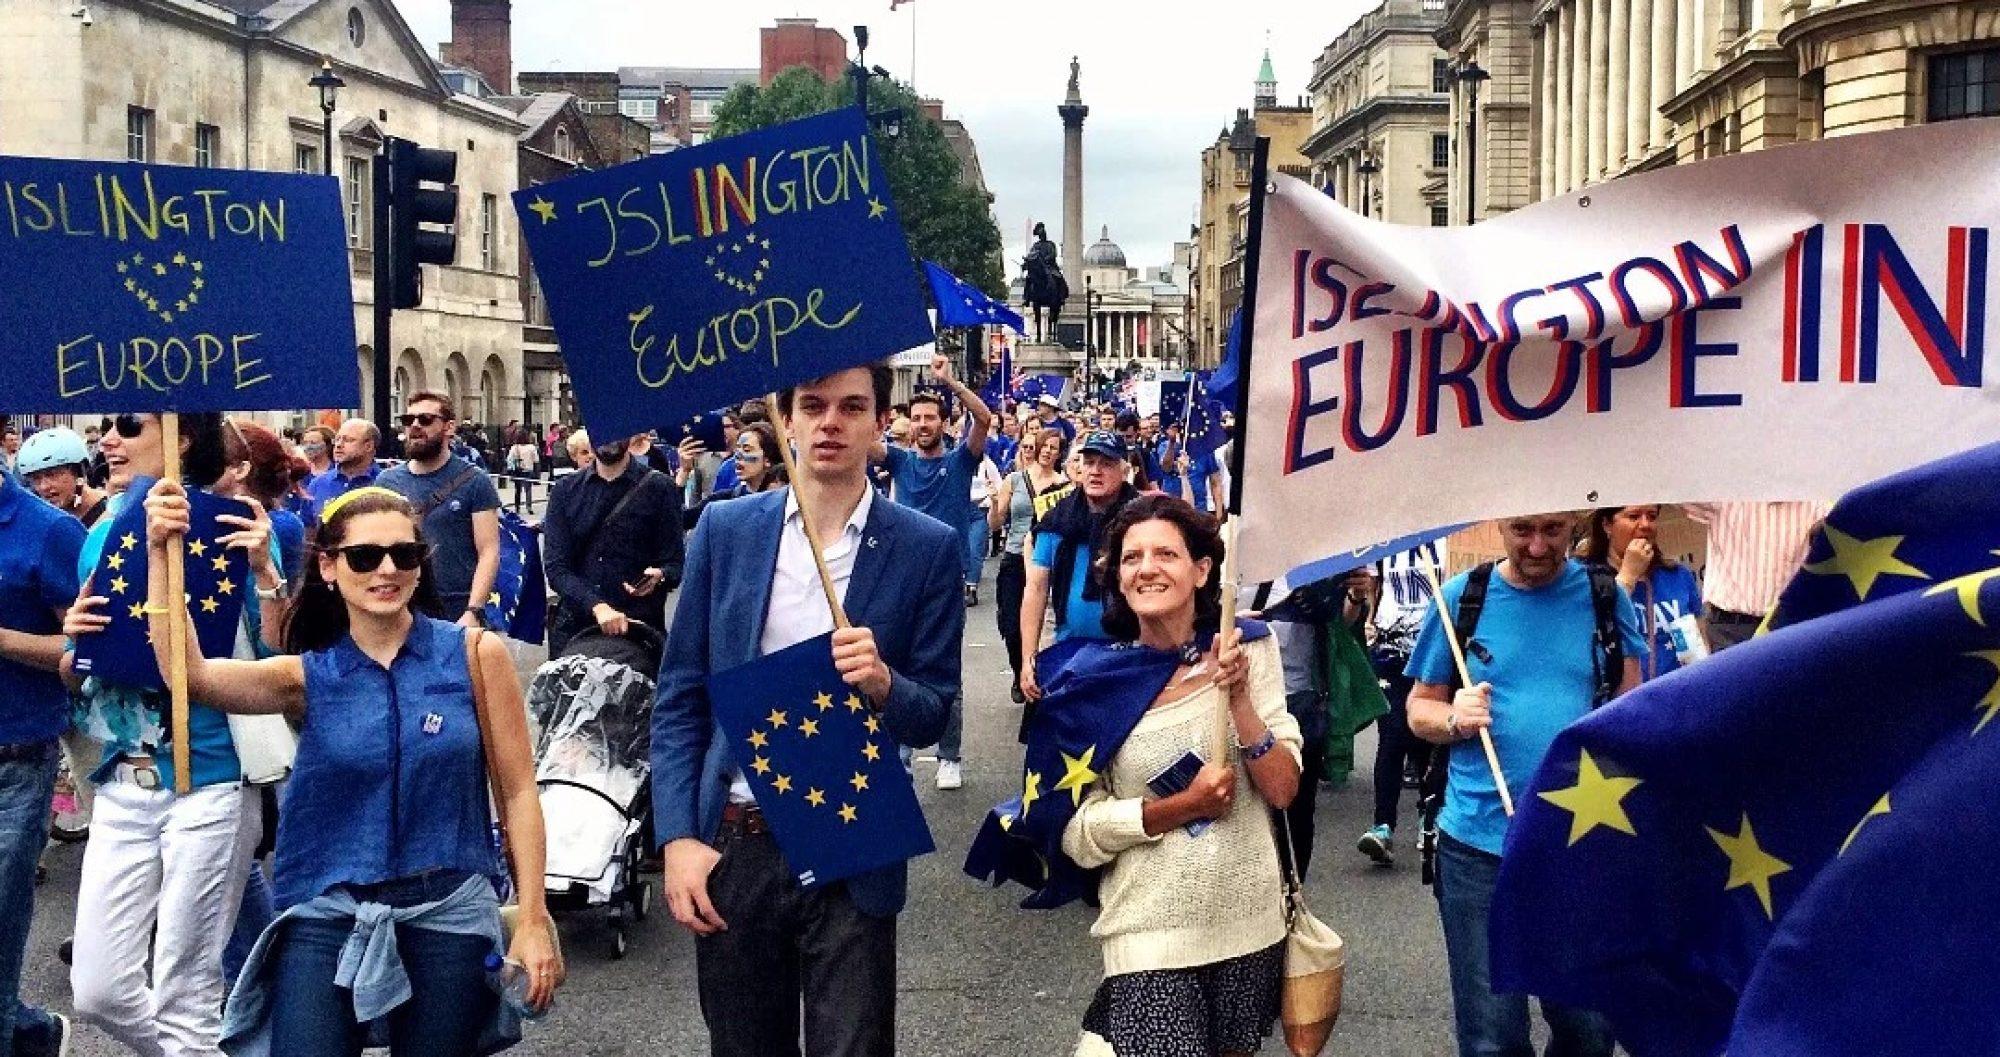 Islington IN Europe